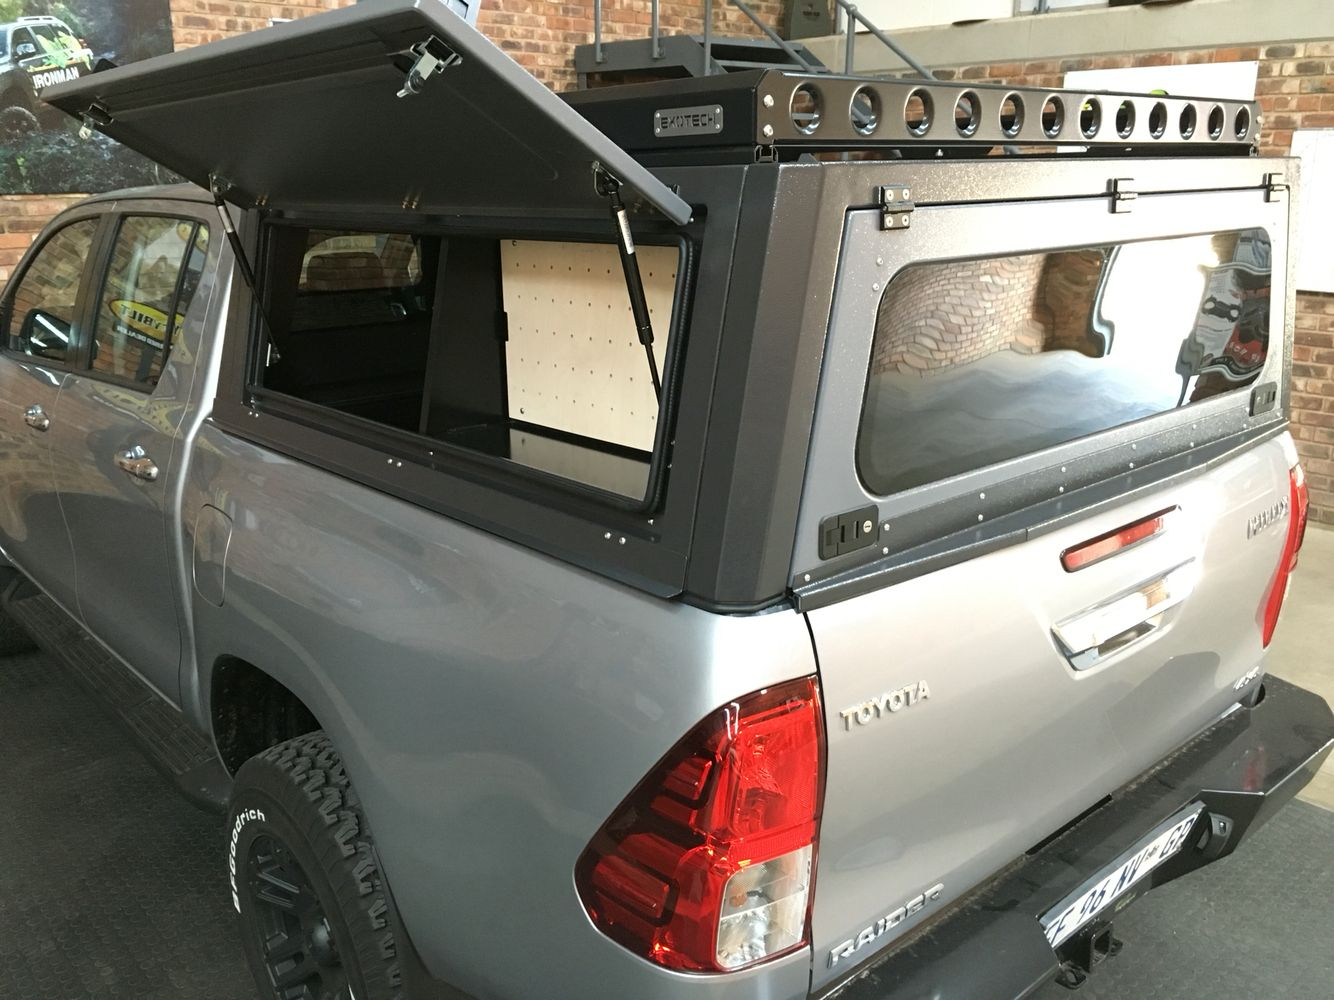 Hilux Aluminium Canopy & Hilux Aluminium Canopy | Toyota Hilux 4x4 | Pinterest | Canopy ...